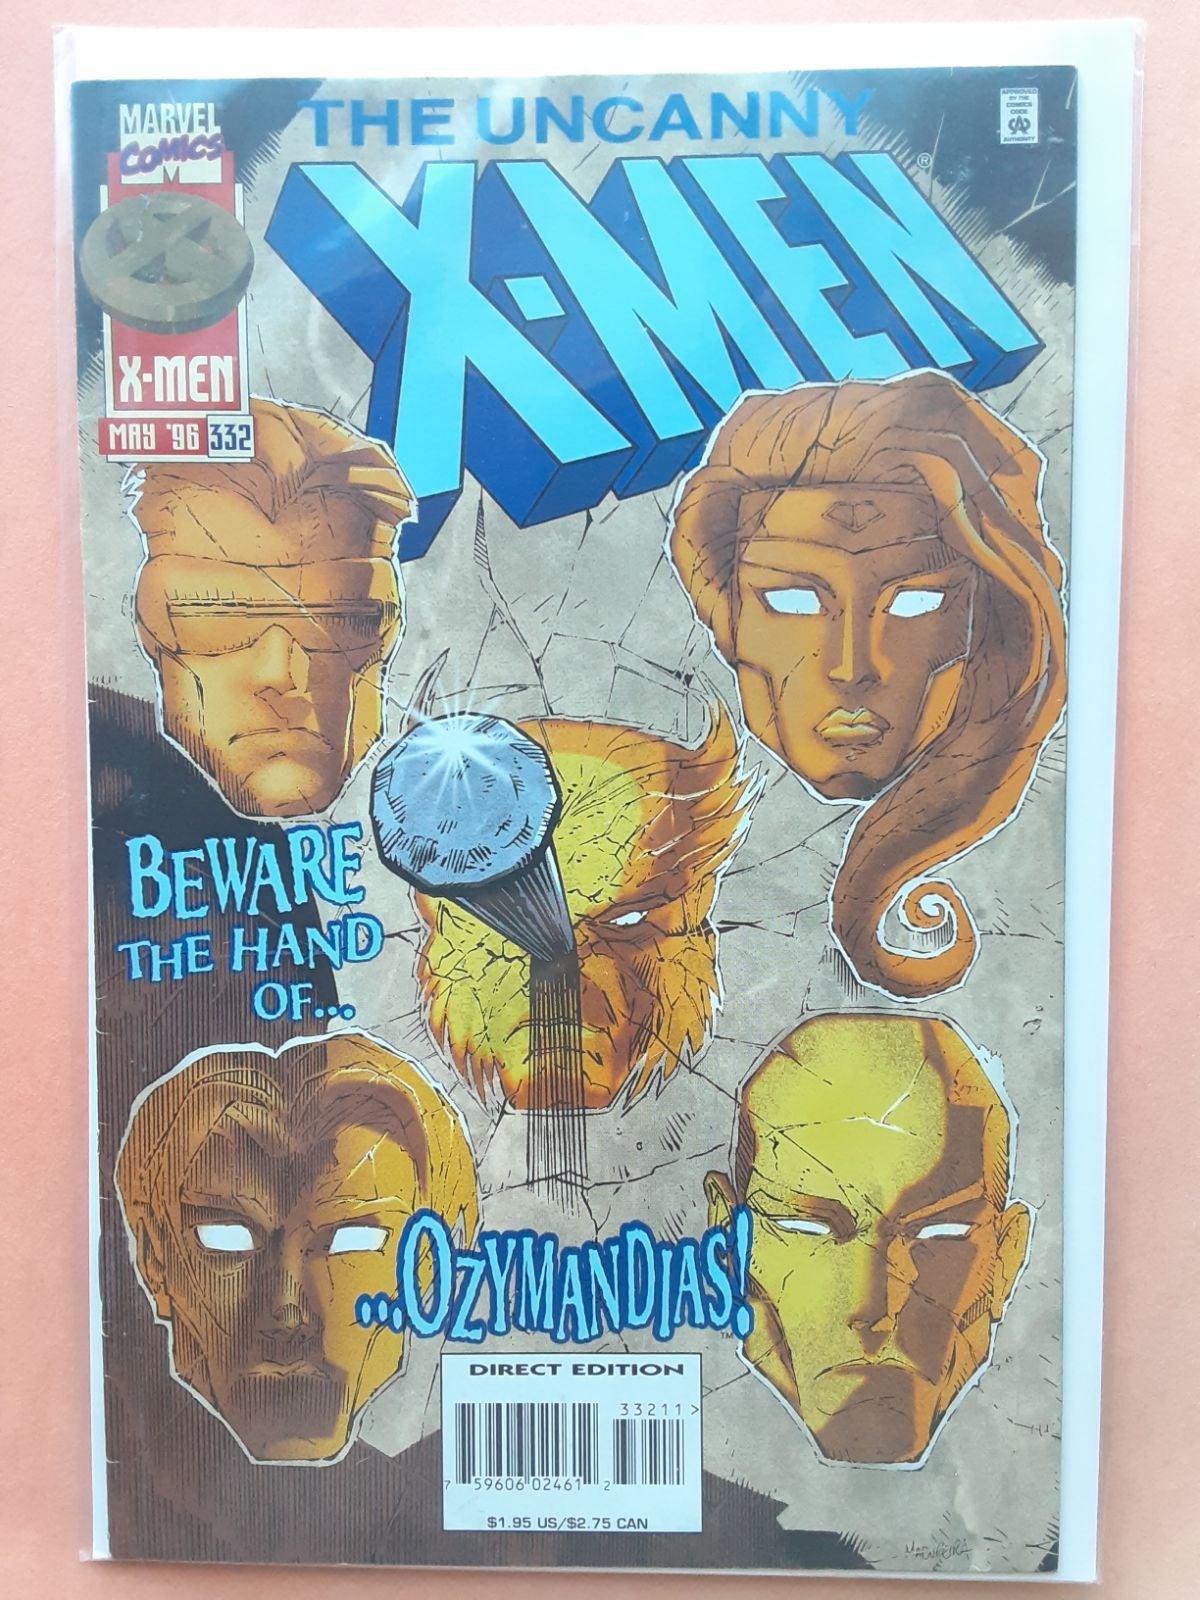 THE UNCANNY XMEN #332